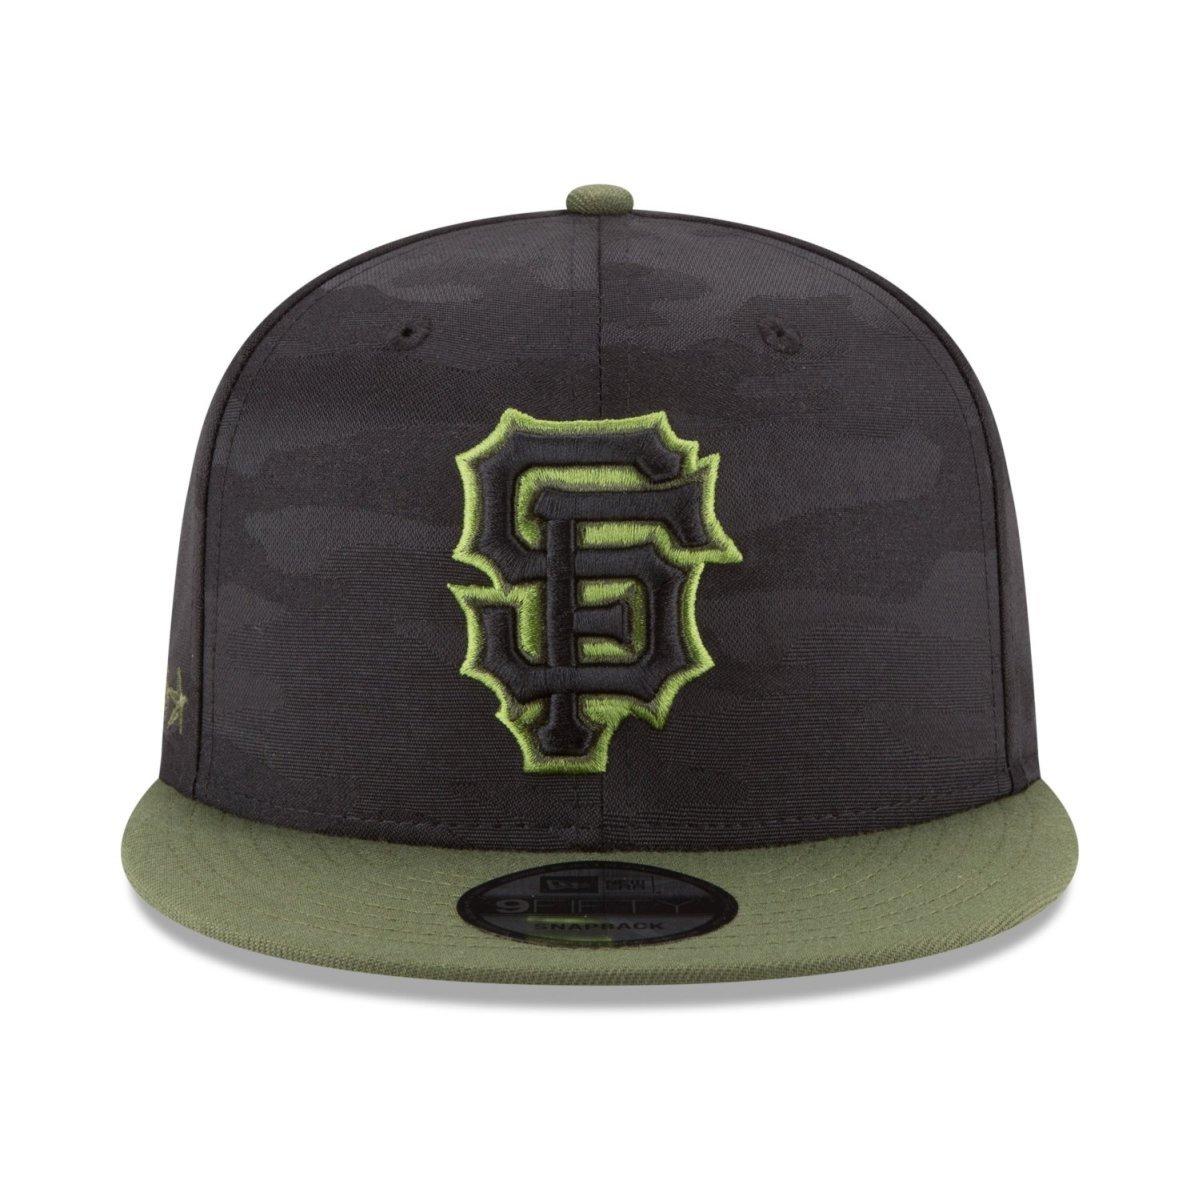 4bba66535 Amazon.com  New Era San Francisco Giants 2018 Memorial Day 9FIFTY  Adjustable Snapback Hat  Clothing